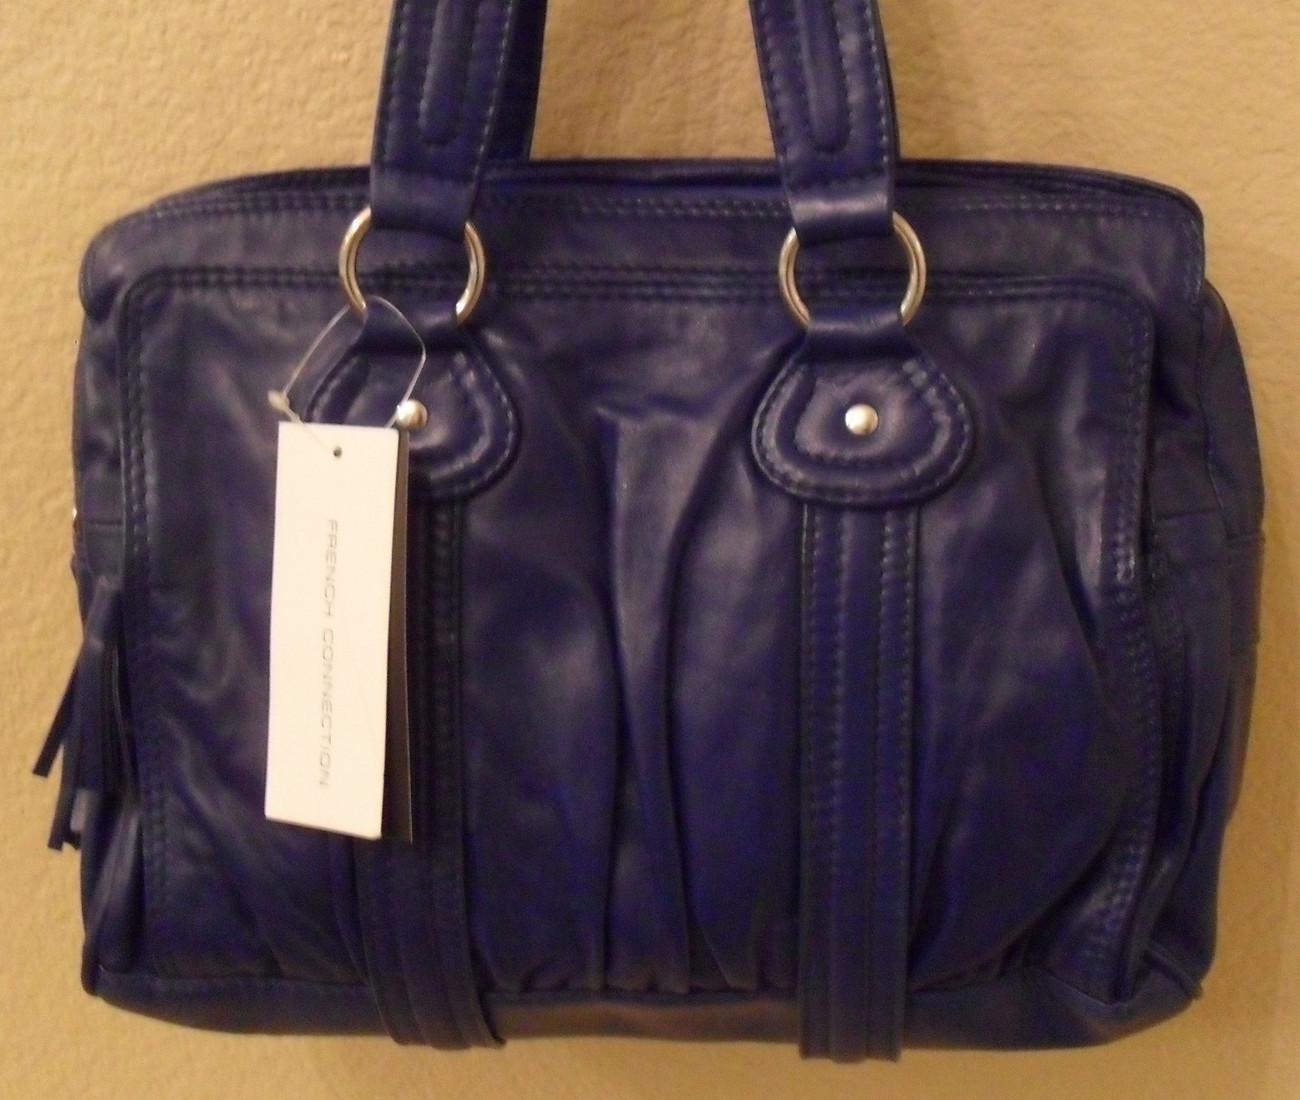 NWT FRENCH CONNECTION Acid Drop Blue Leather Satchel Handbag (MAKE AN OFFER)